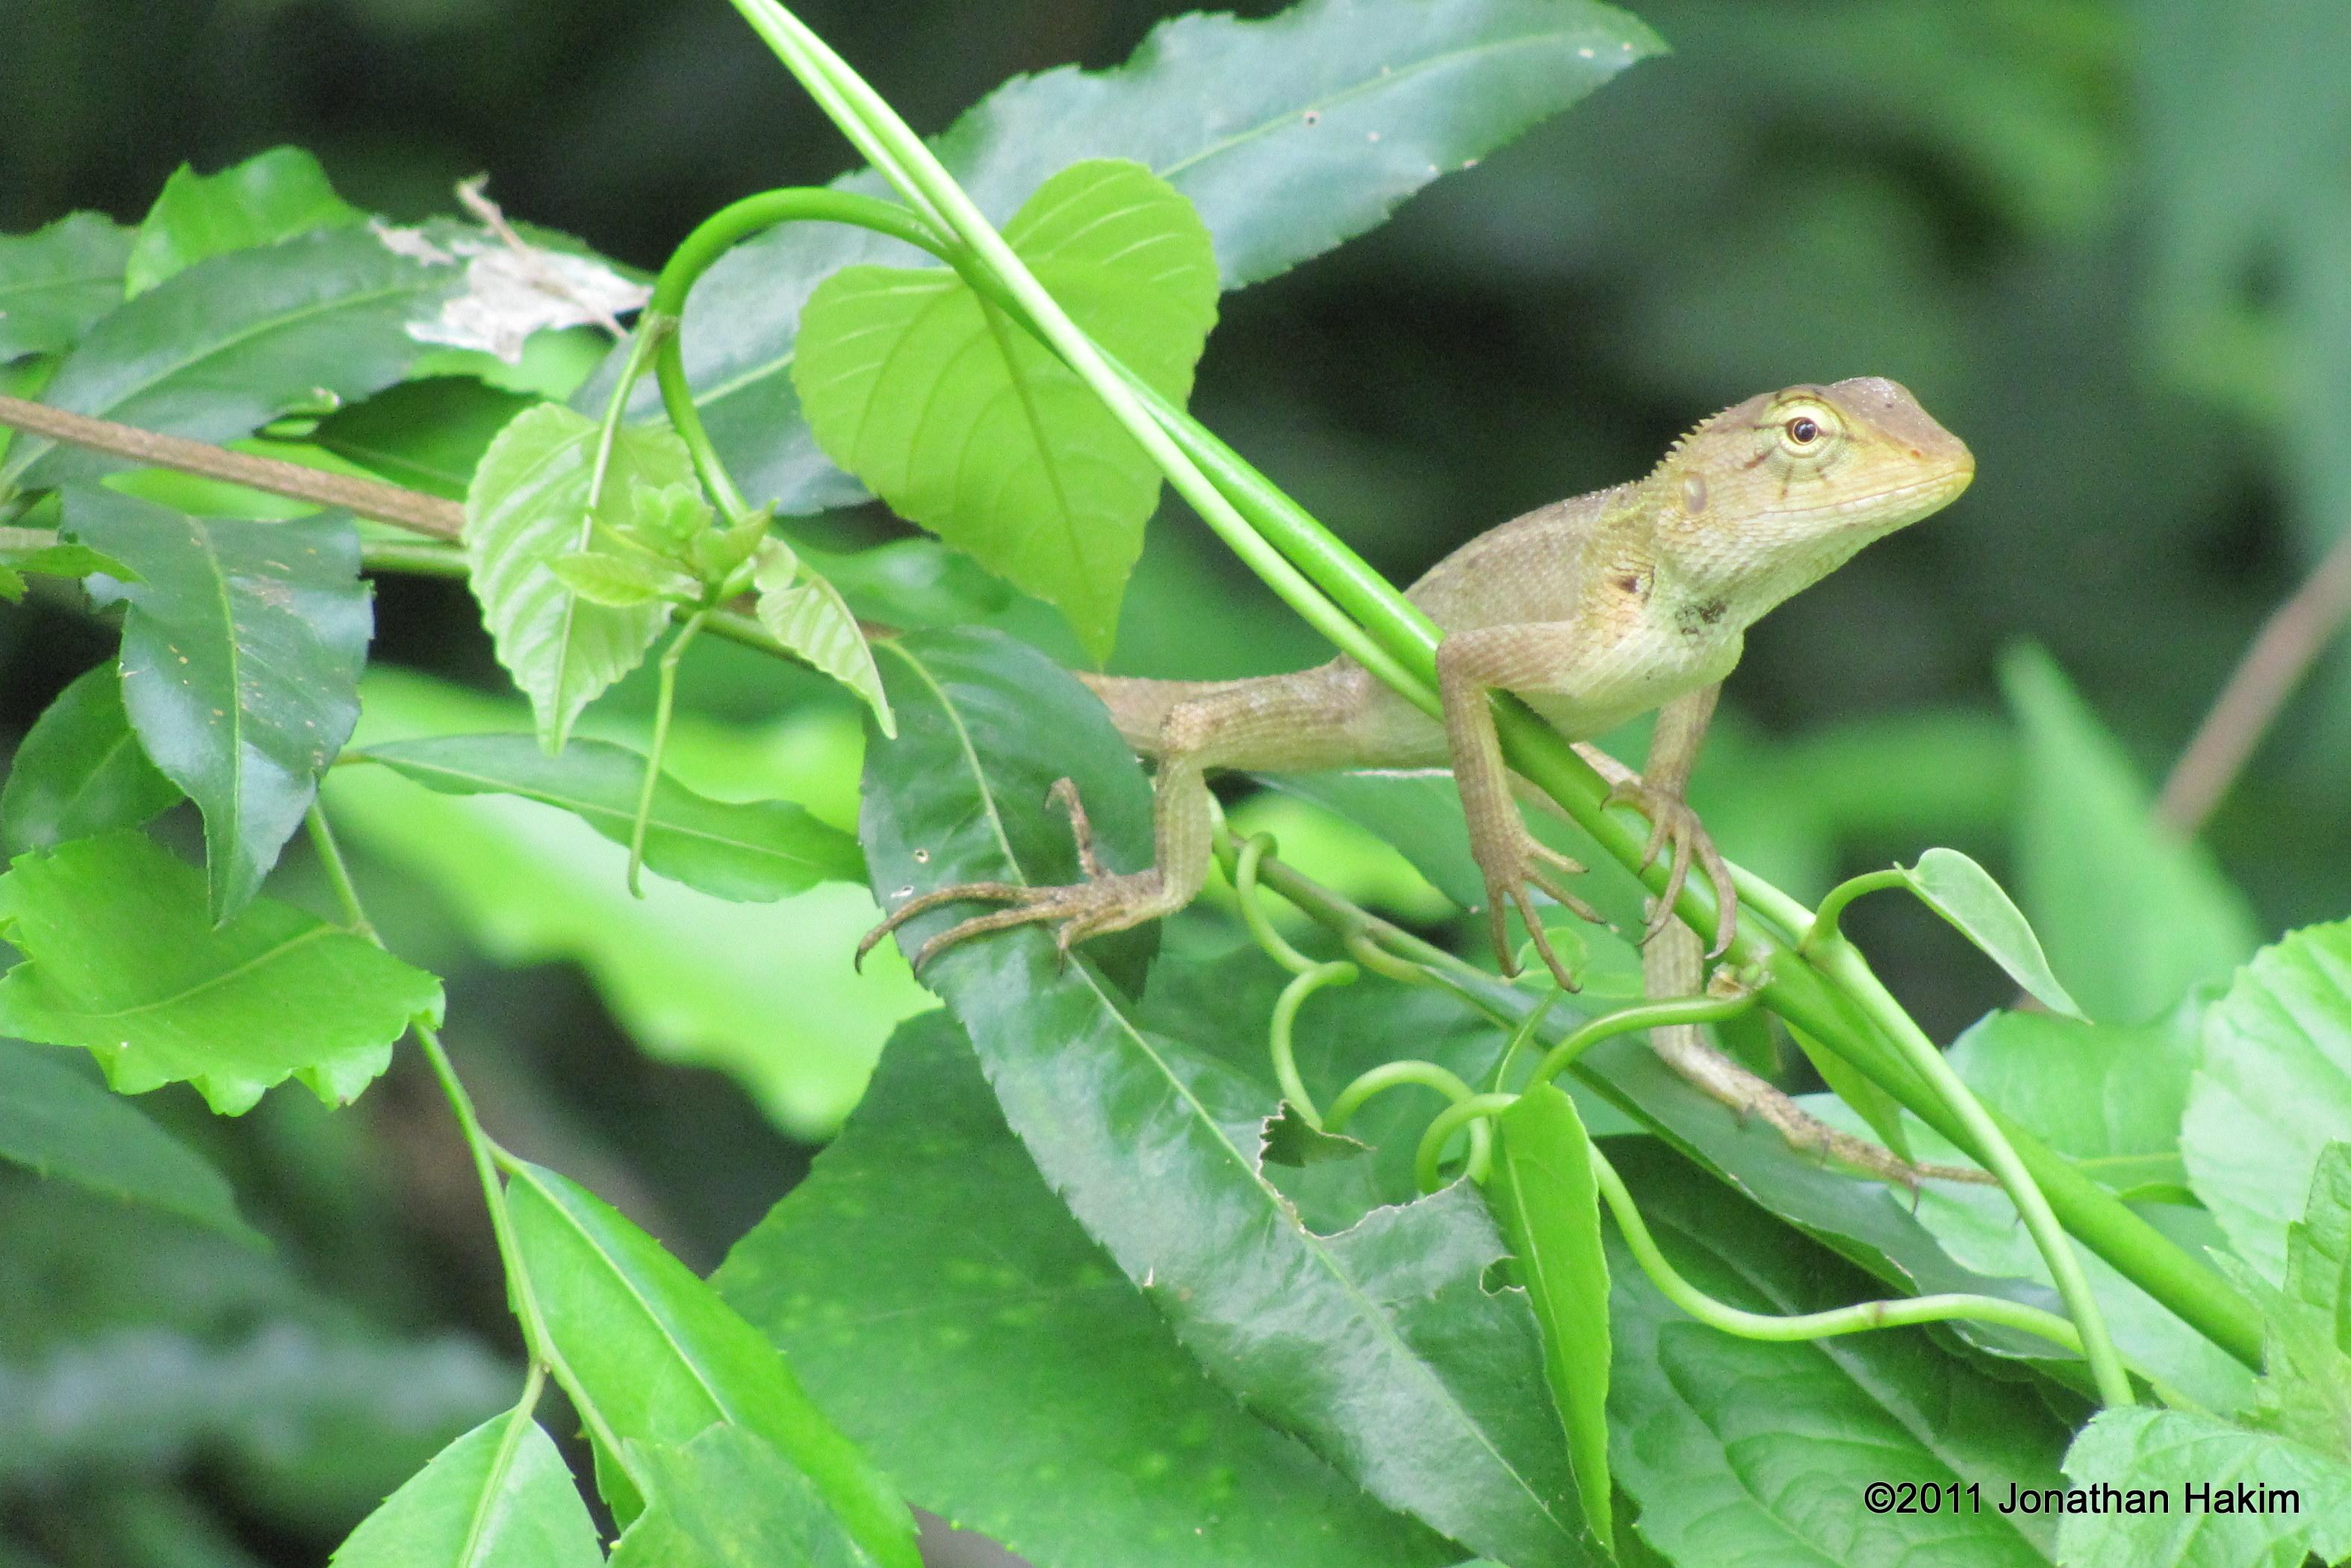 oriental garden lizard care | fasci garden